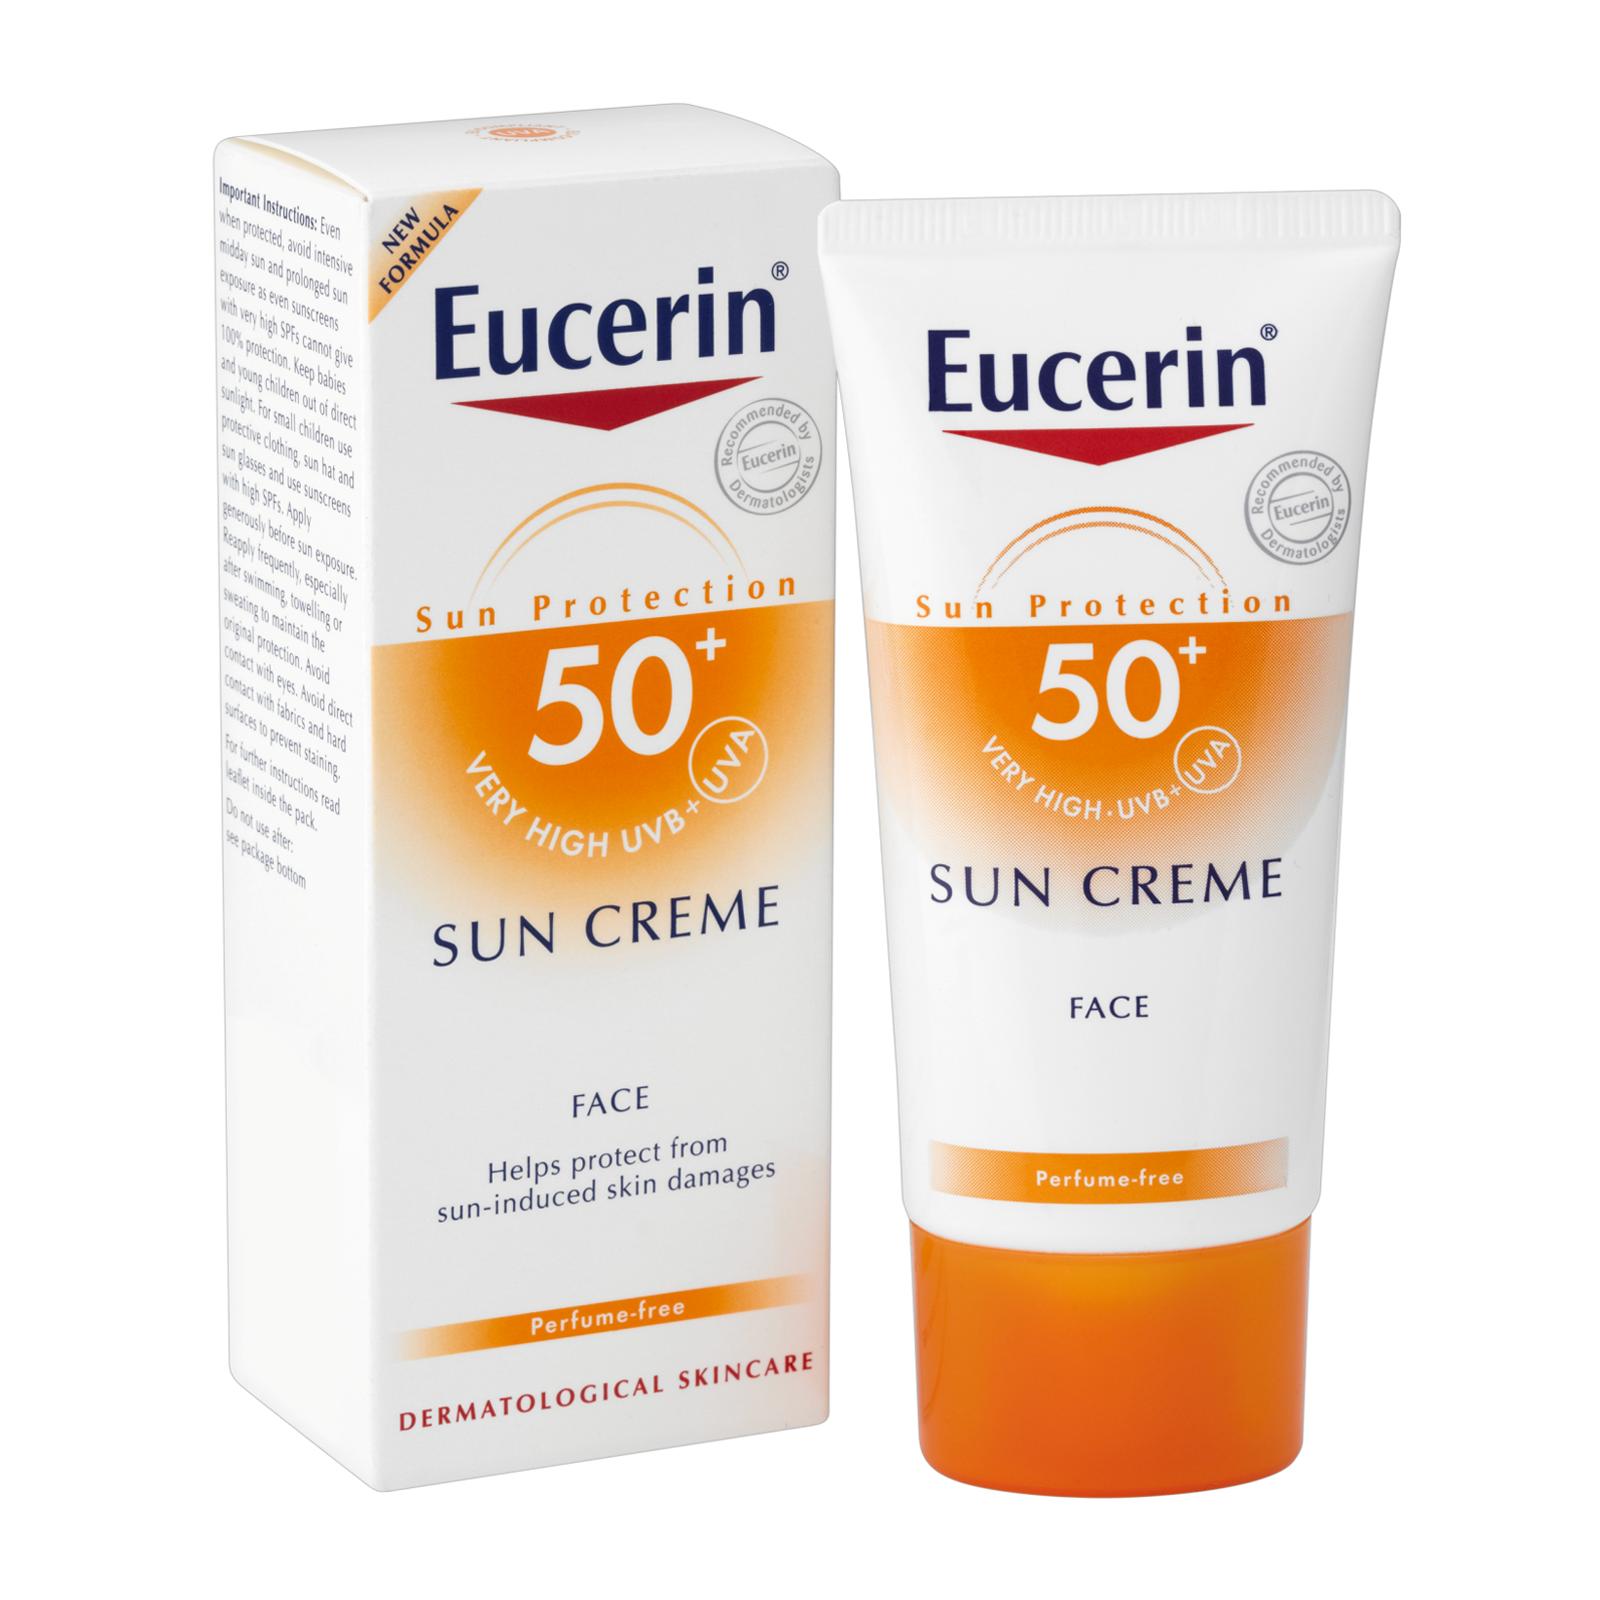 eucerin sun face cream spf50 50ml water resistant sun protection cream. Black Bedroom Furniture Sets. Home Design Ideas